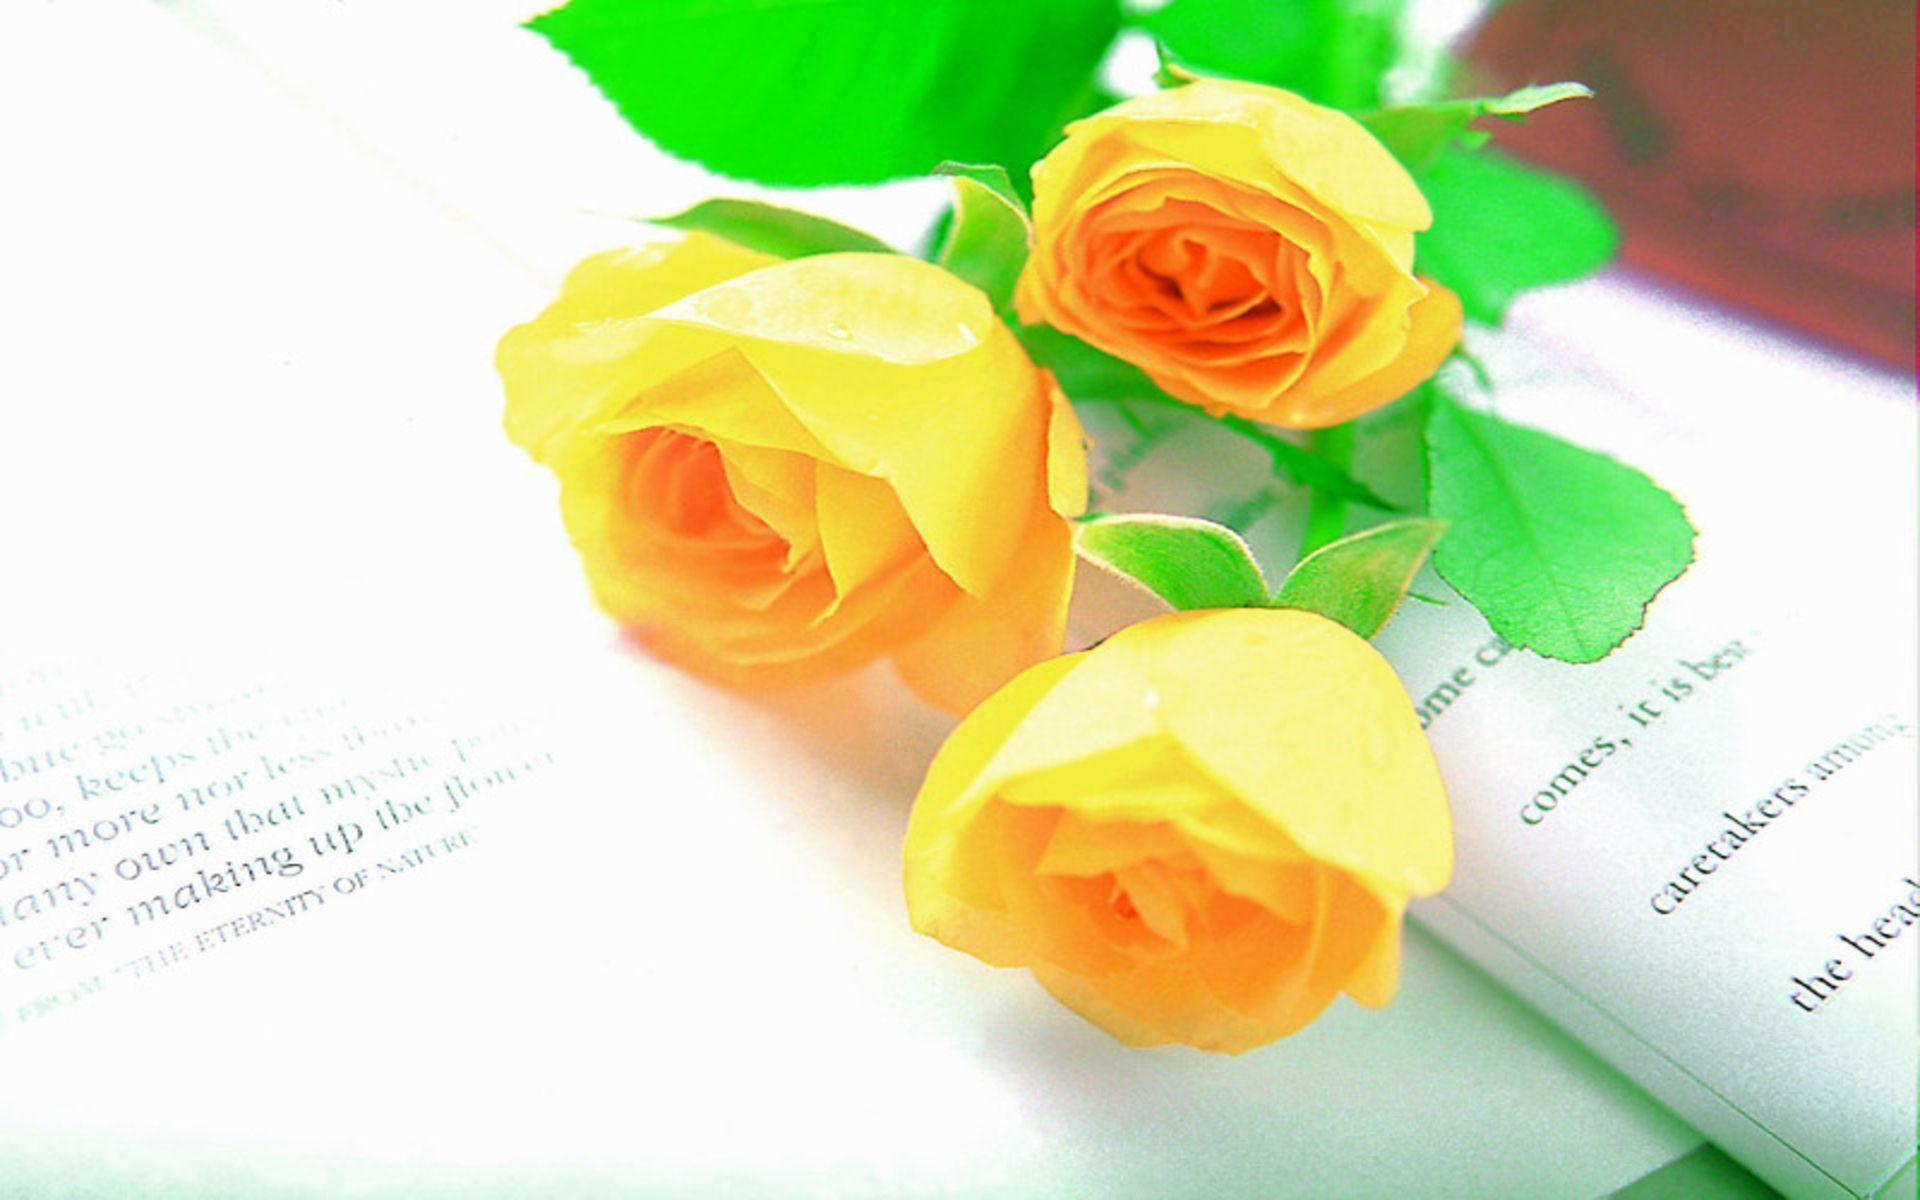 Hd wallpaper yellow rose - Hd Yellow Roses Wallpaper Download Free 1920x1200px Hd Wallpaper